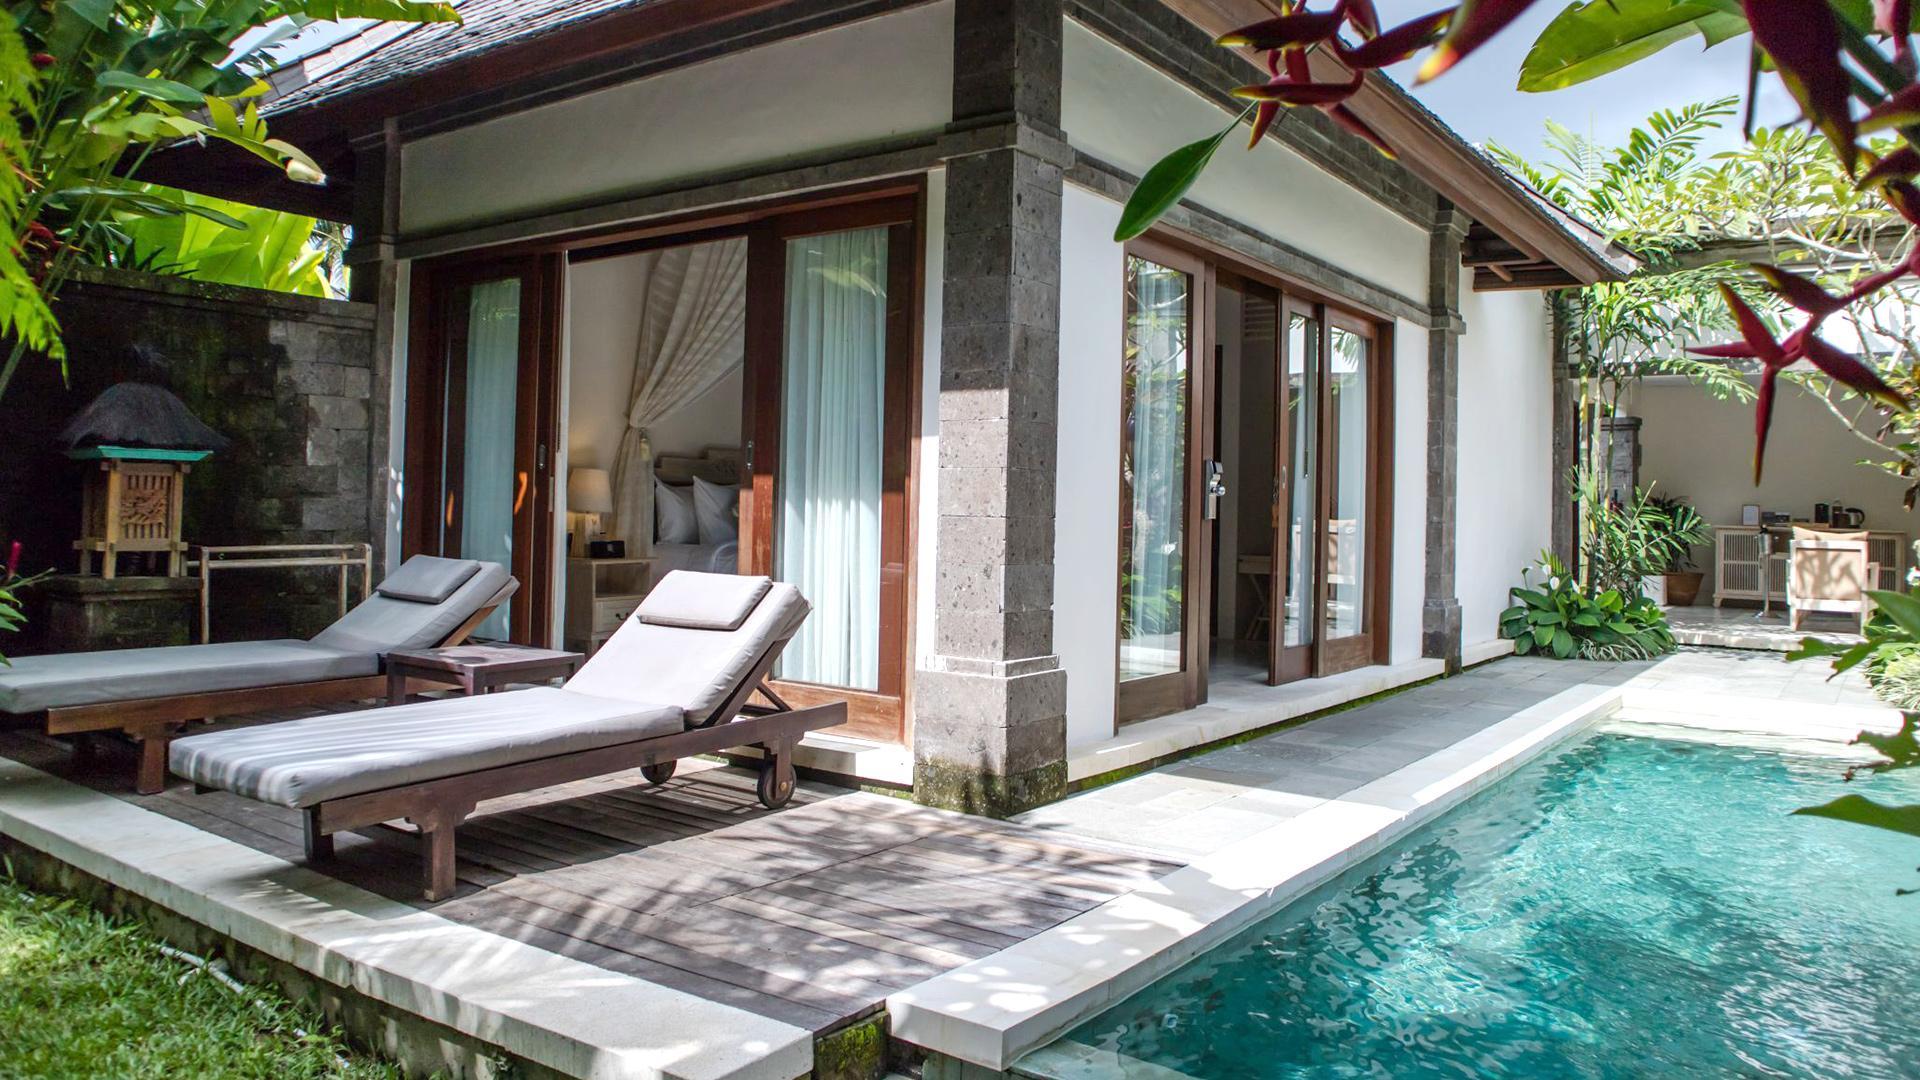 One Bedroom Pool Villa image 1 at  Desa Visesa Ubud by Gianyar, Bali, Indonesia